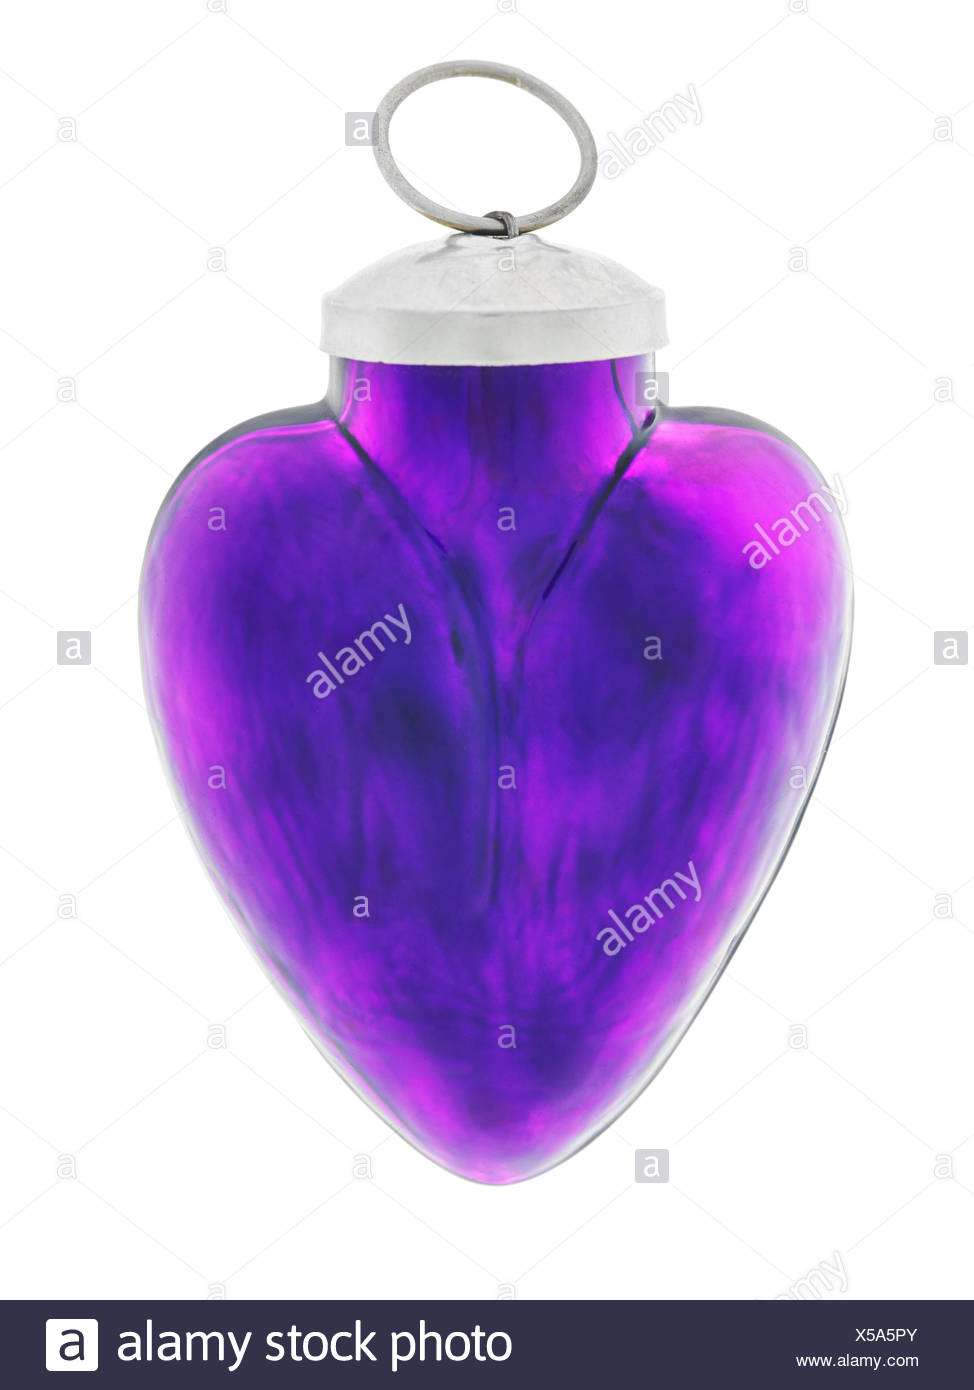 lila Herz aus Glas auf weiß - Stock Image